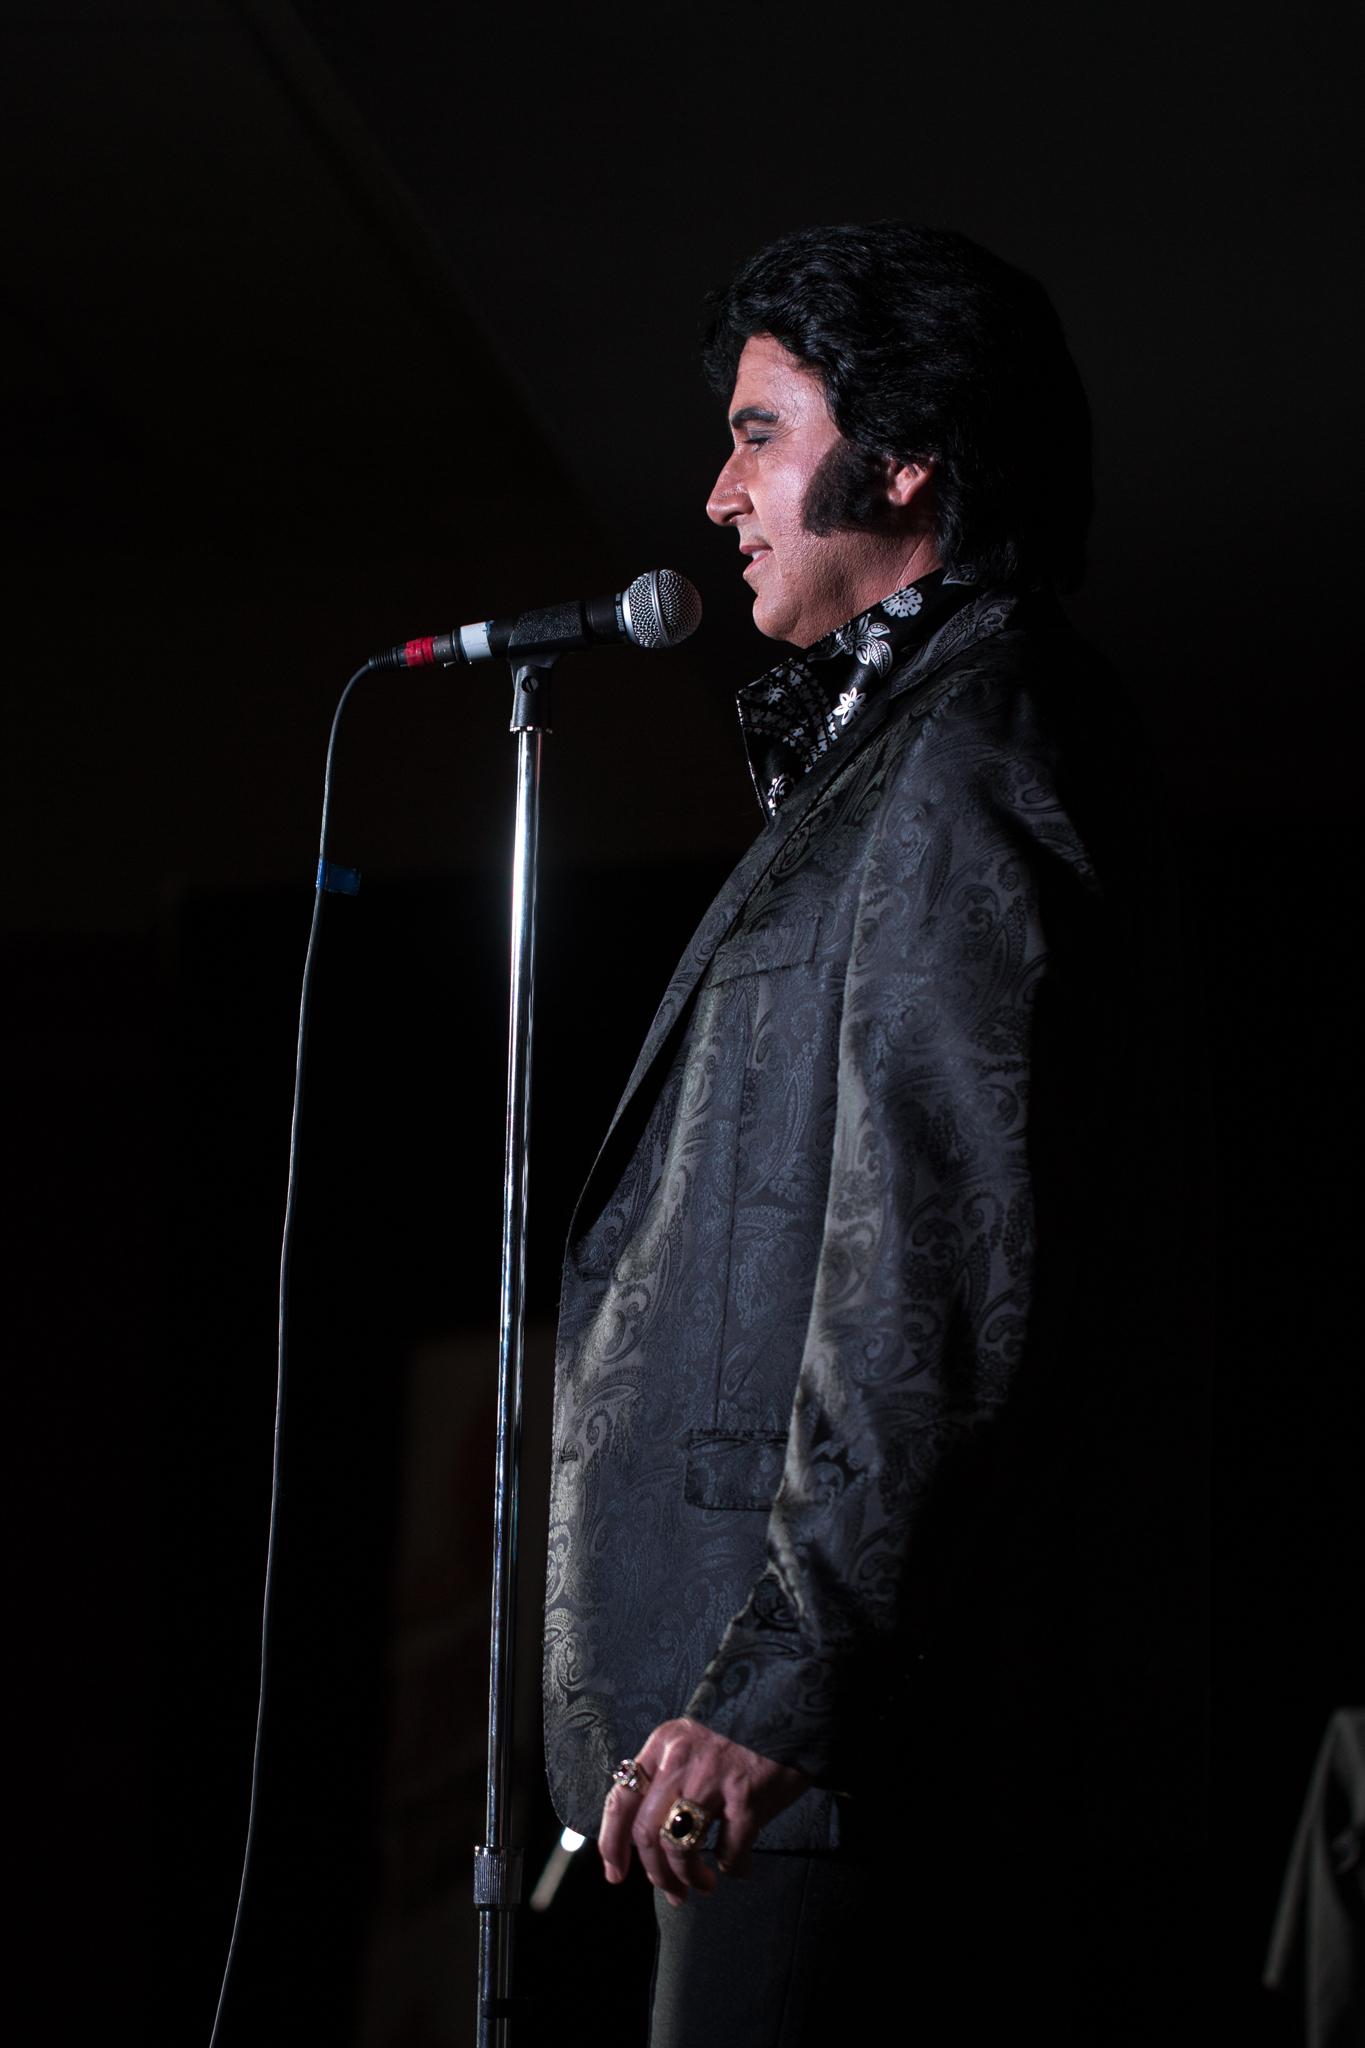 ETA  Sylvain Leduc  performing at the Flaming Star Festival, 2017